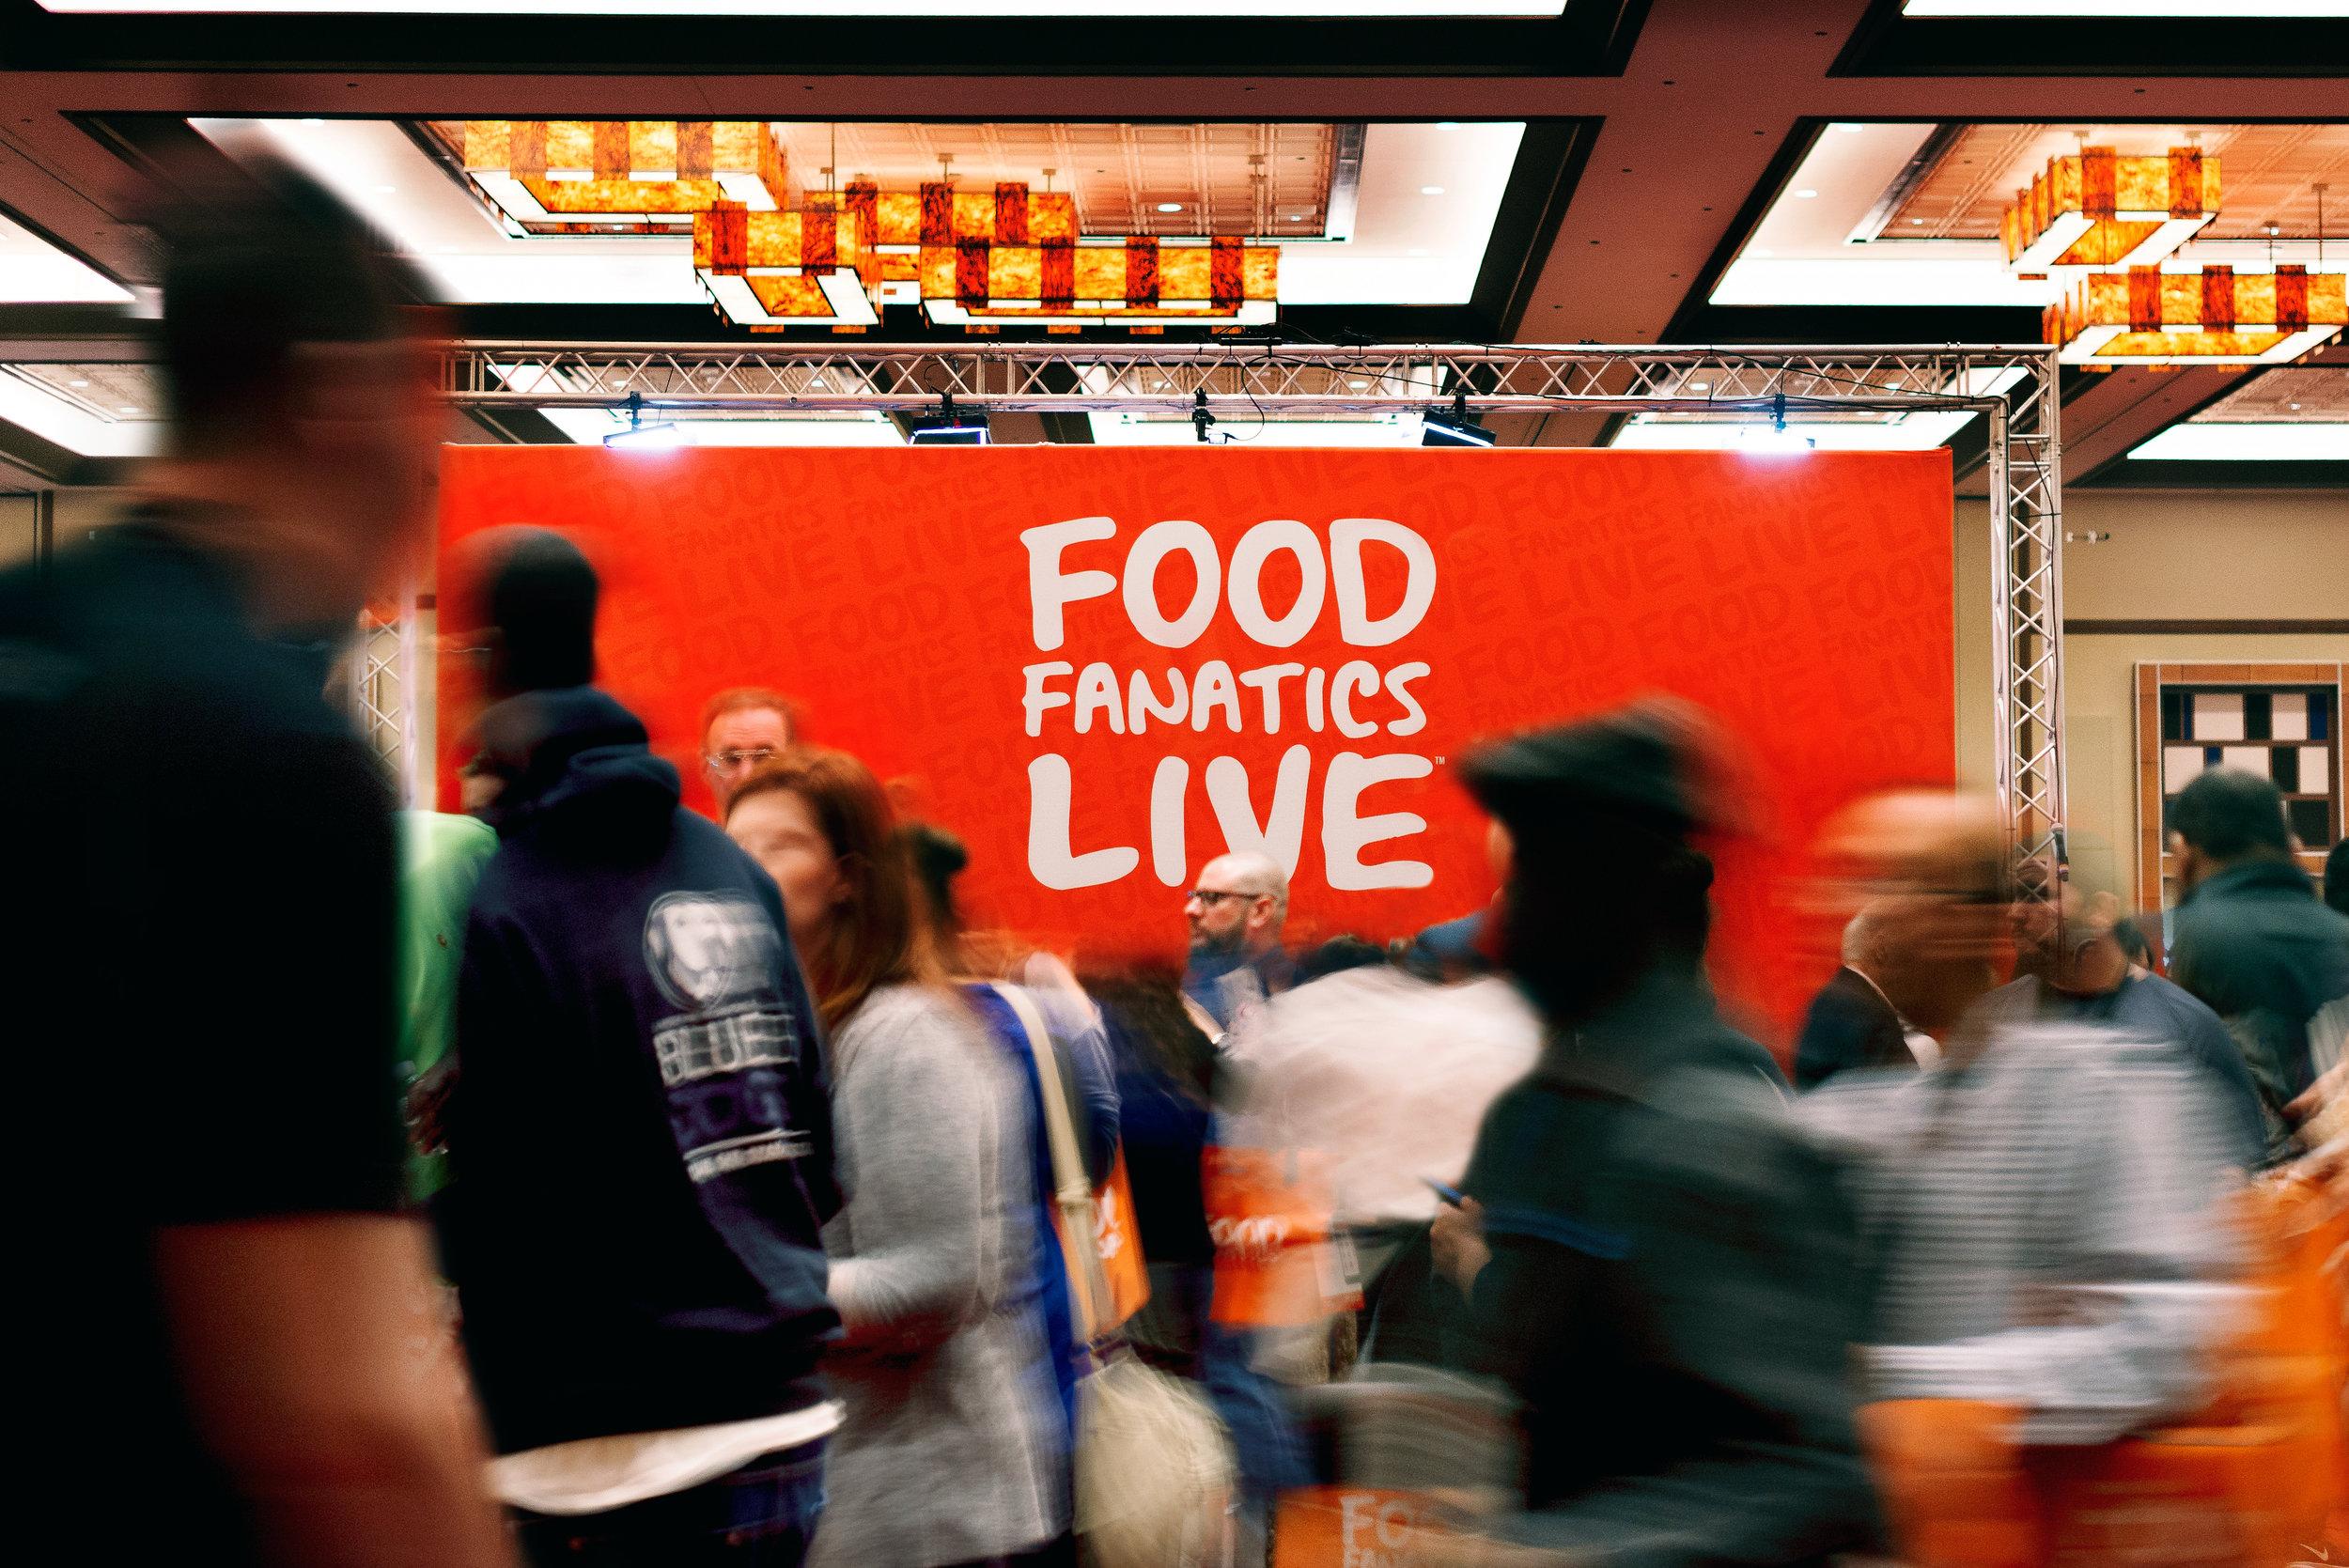 FoodFanaticsLive-Event-Food-Photography064.jpg